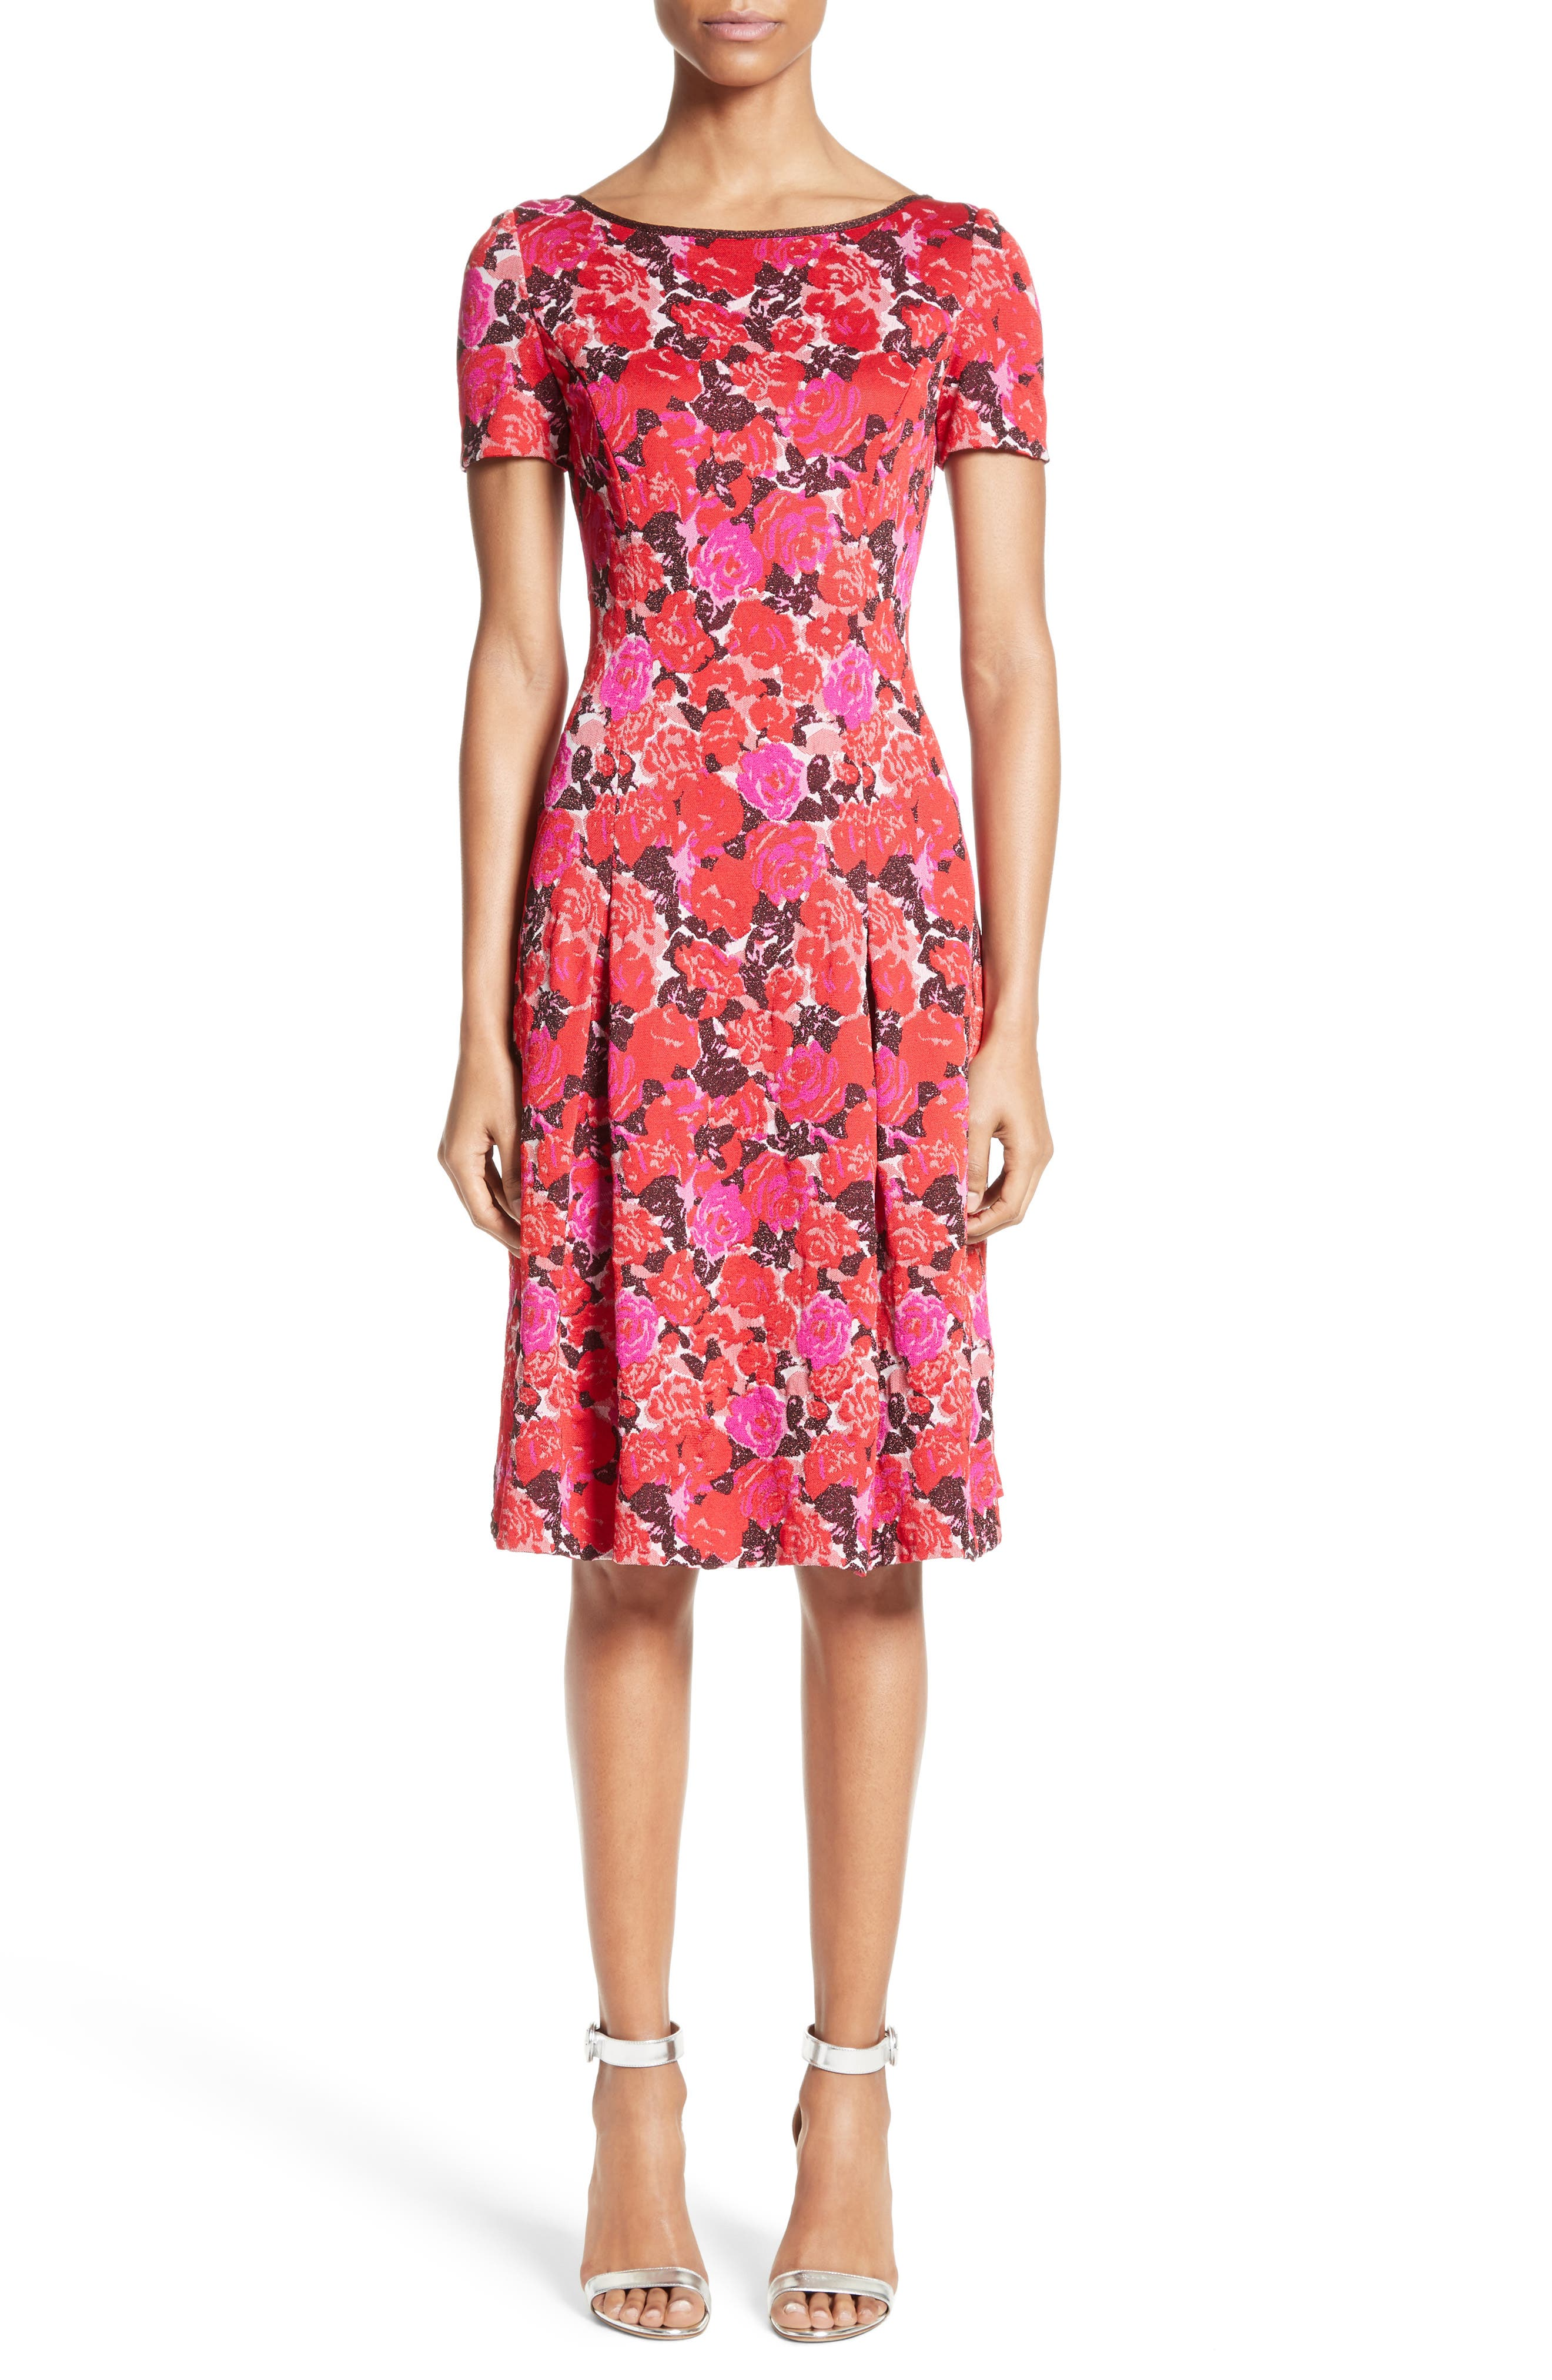 Indian Rose Blister Jacquard Dress,                         Main,                         color, Red Multi